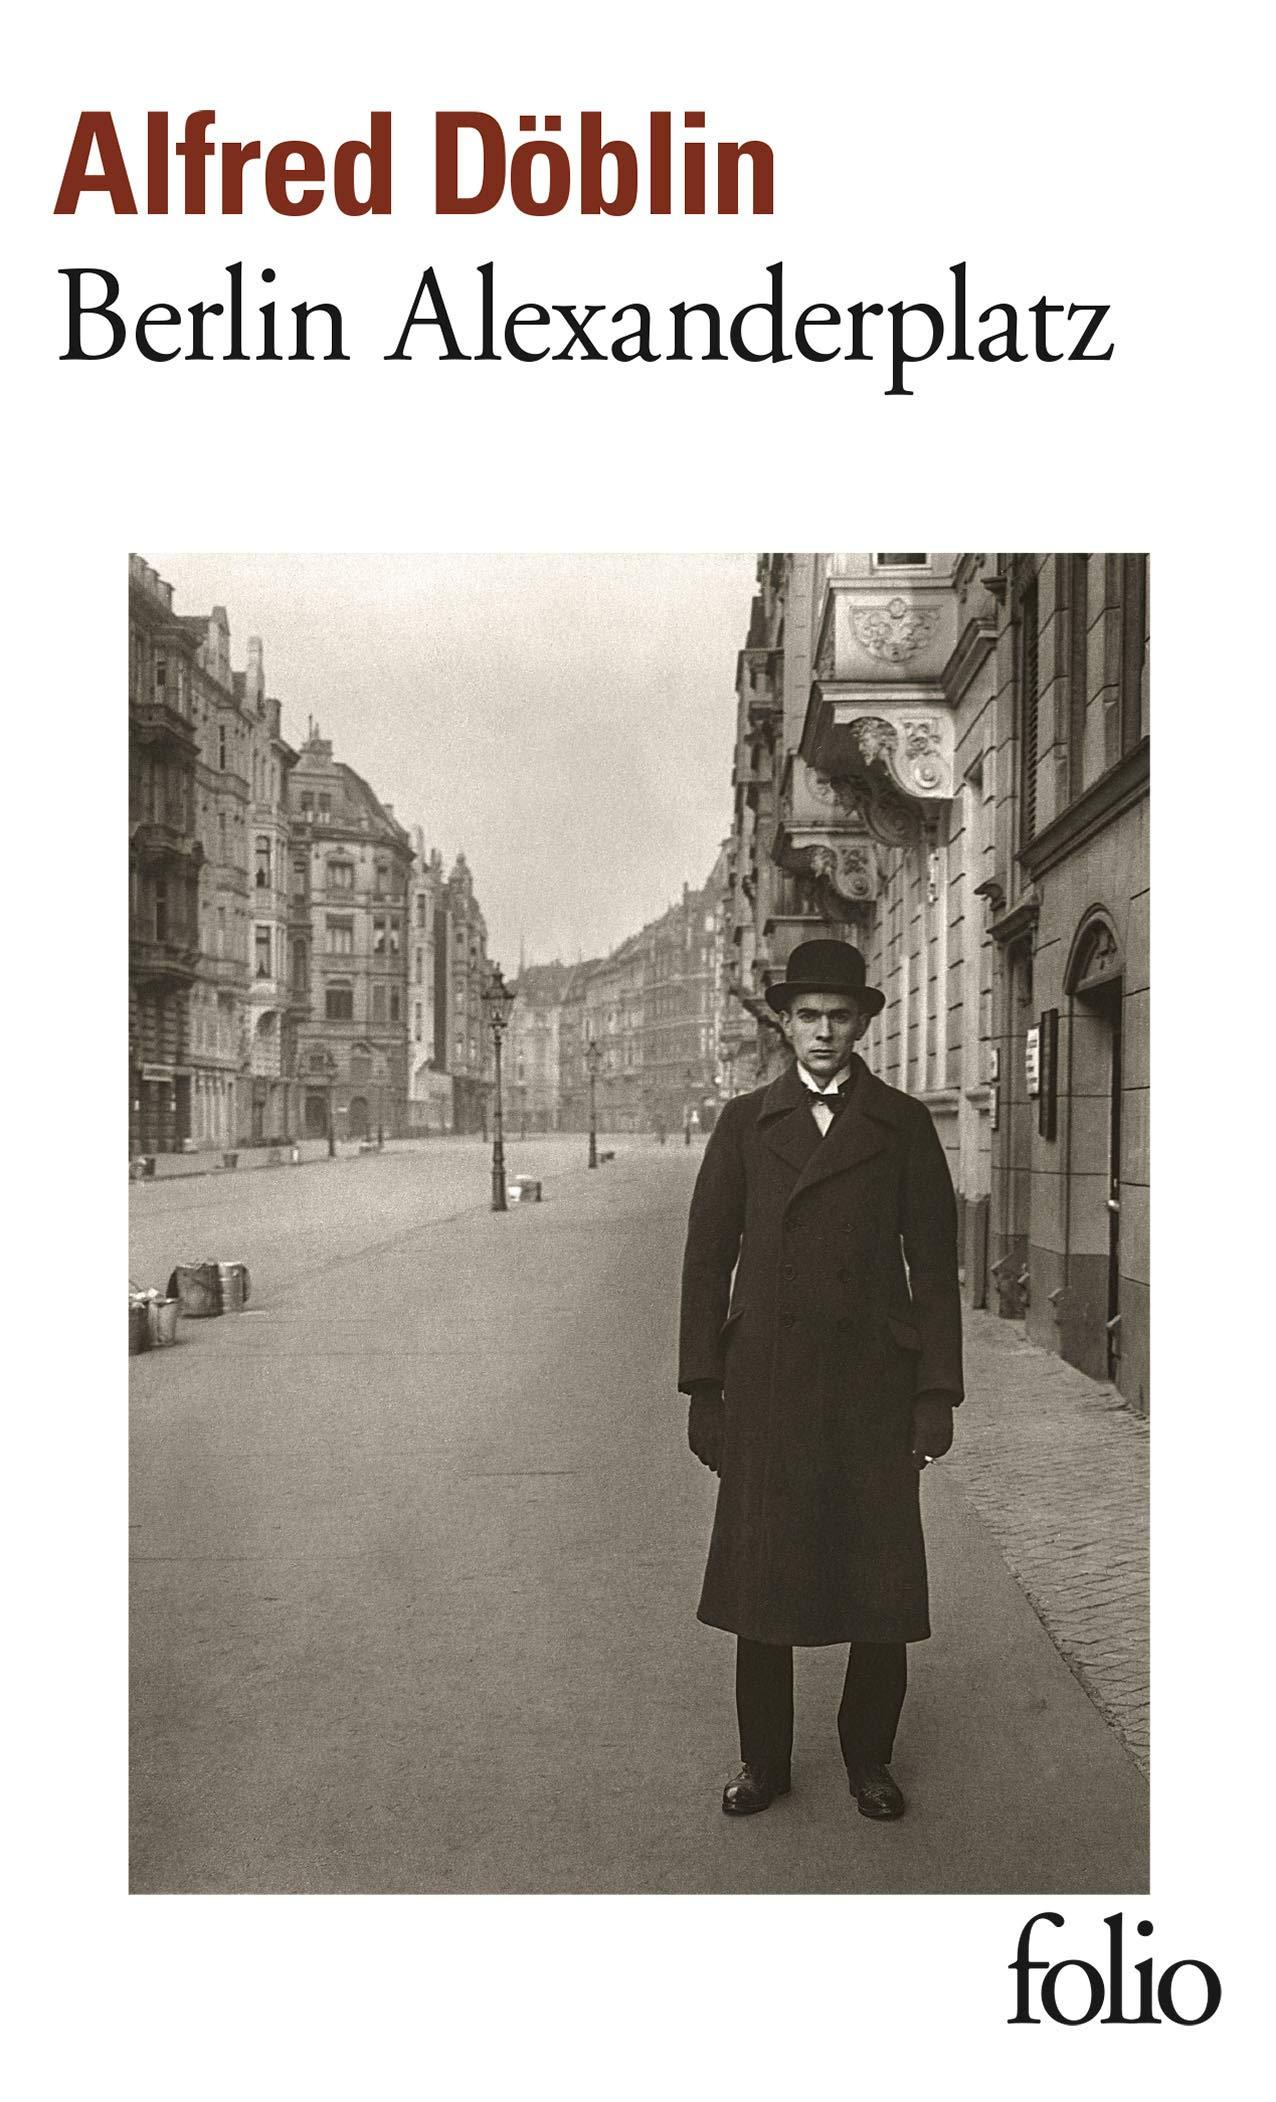 Berlin Alexanderplatz Folio French Edition Alfred Doblin 9782070438365 Amazon Com Books